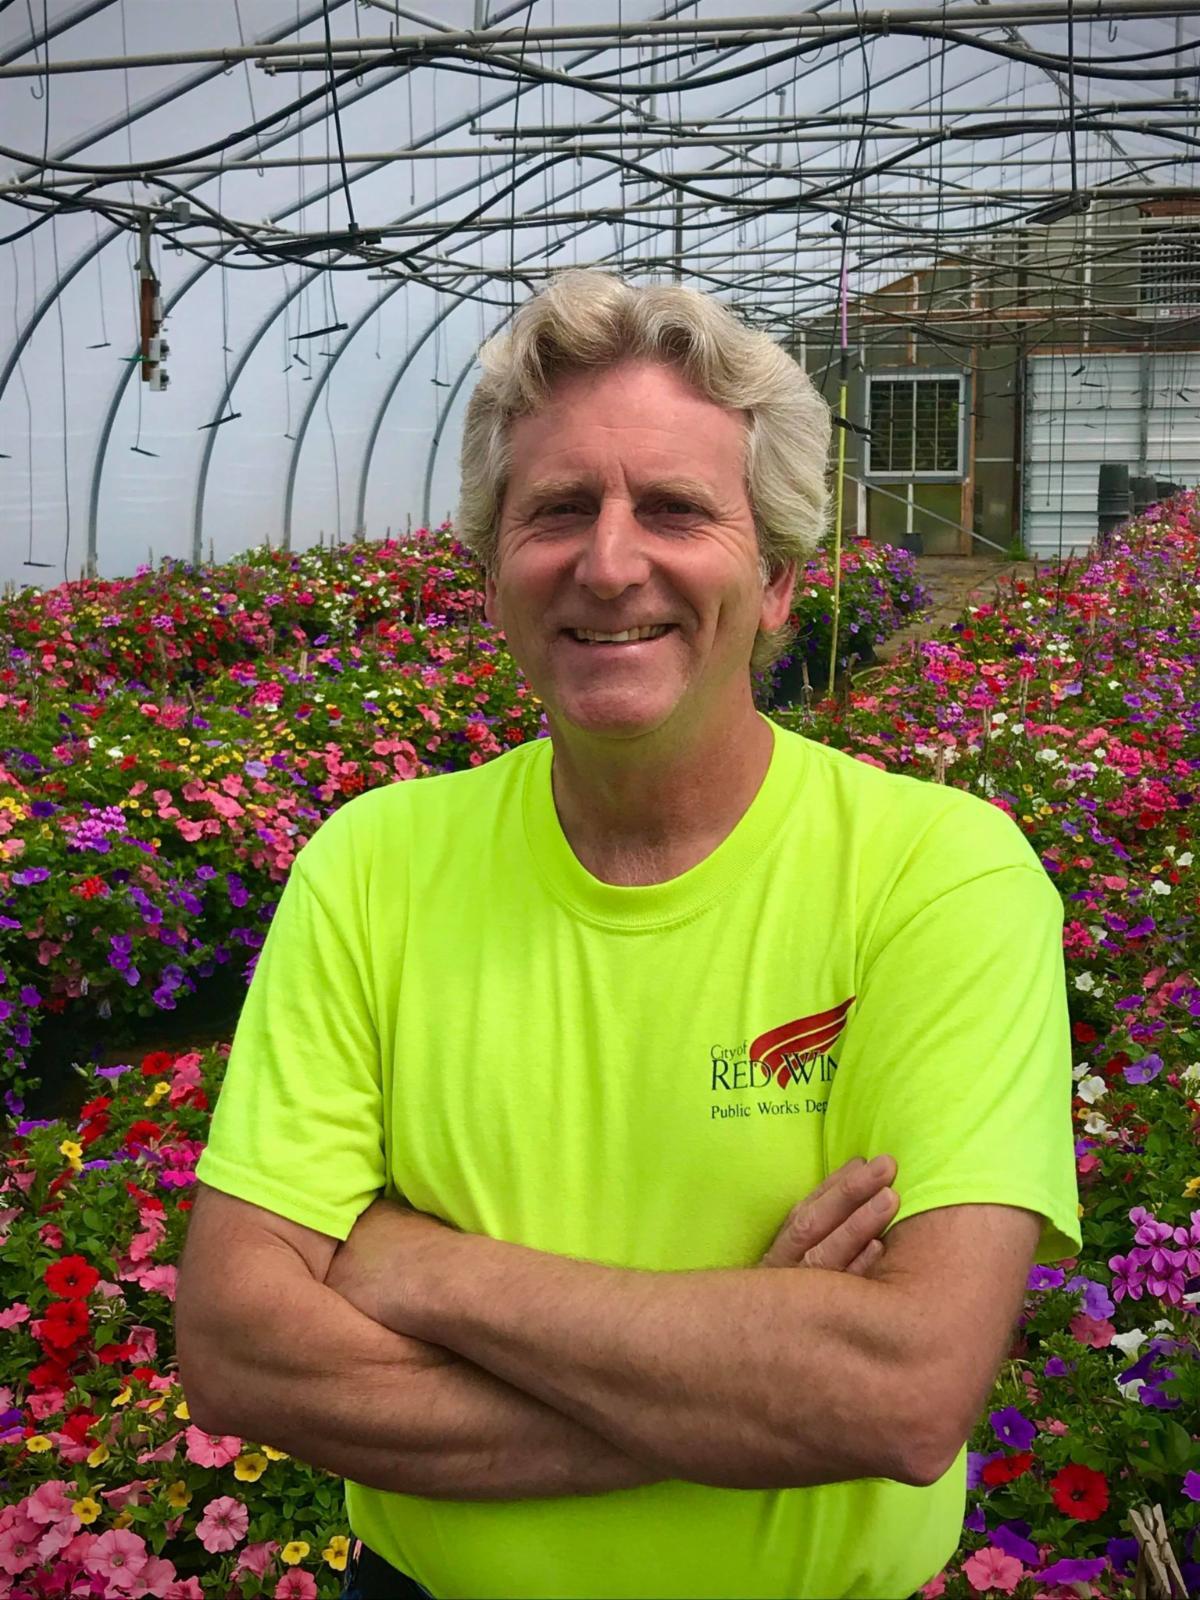 Photo of Brian Biwer standing amongst flower baskets